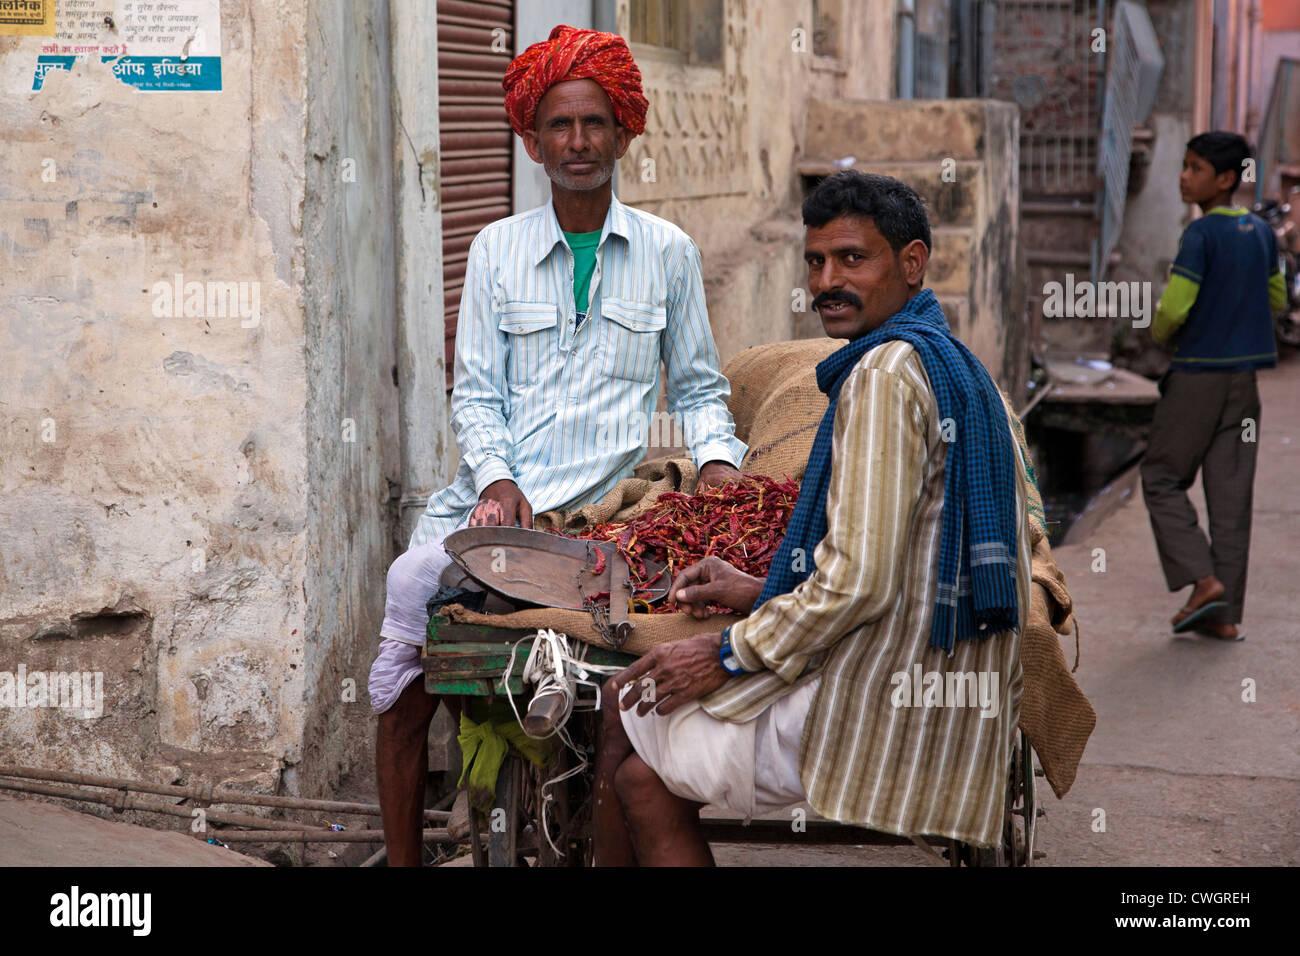 Men selling red peppers on street in Bundi, Rajasthan, India - Stock Image